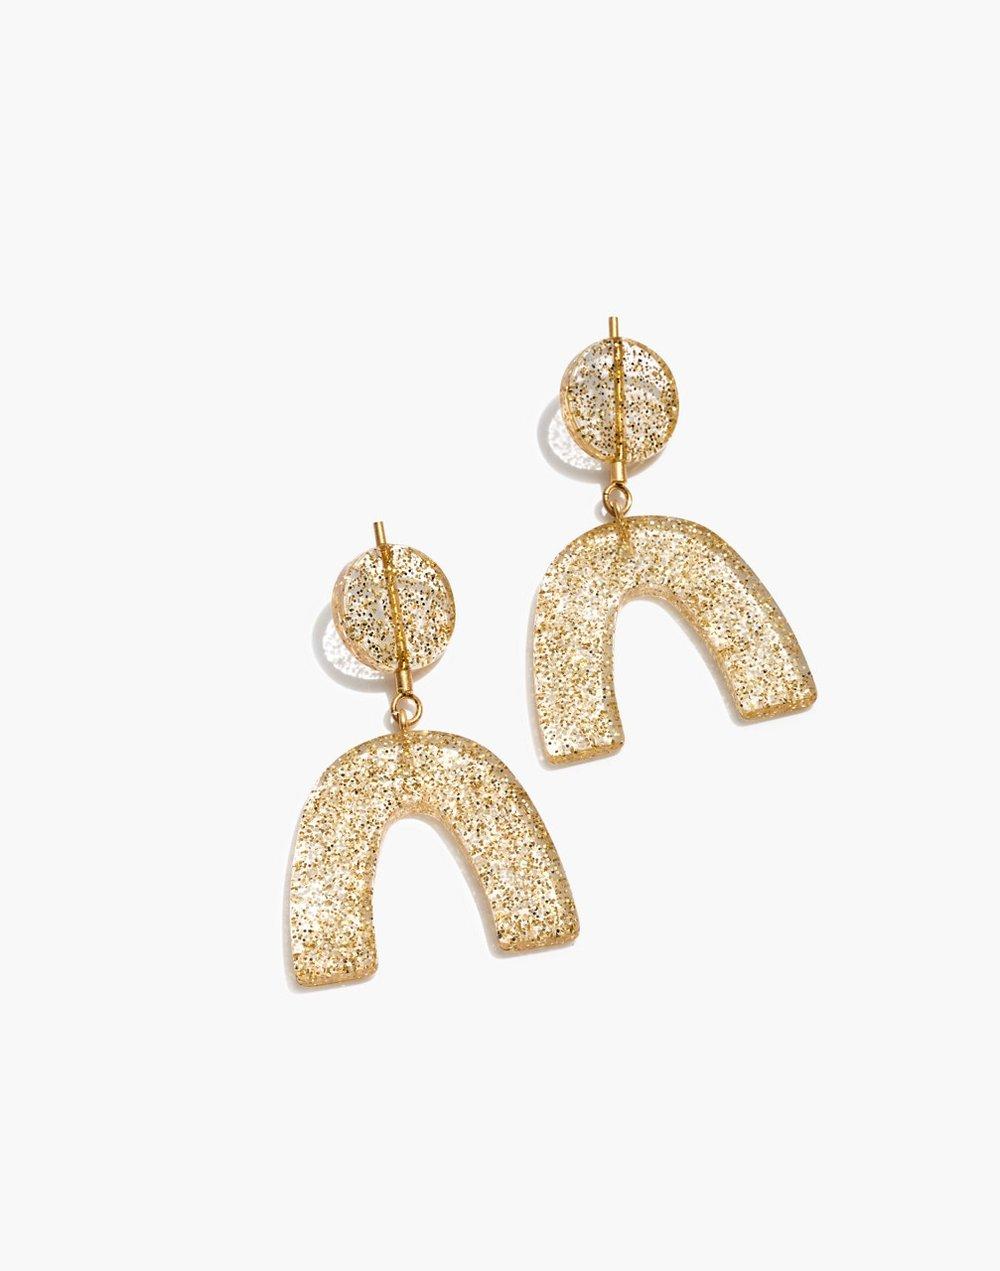 Glitter Shapes Statment Earrings - Madewell